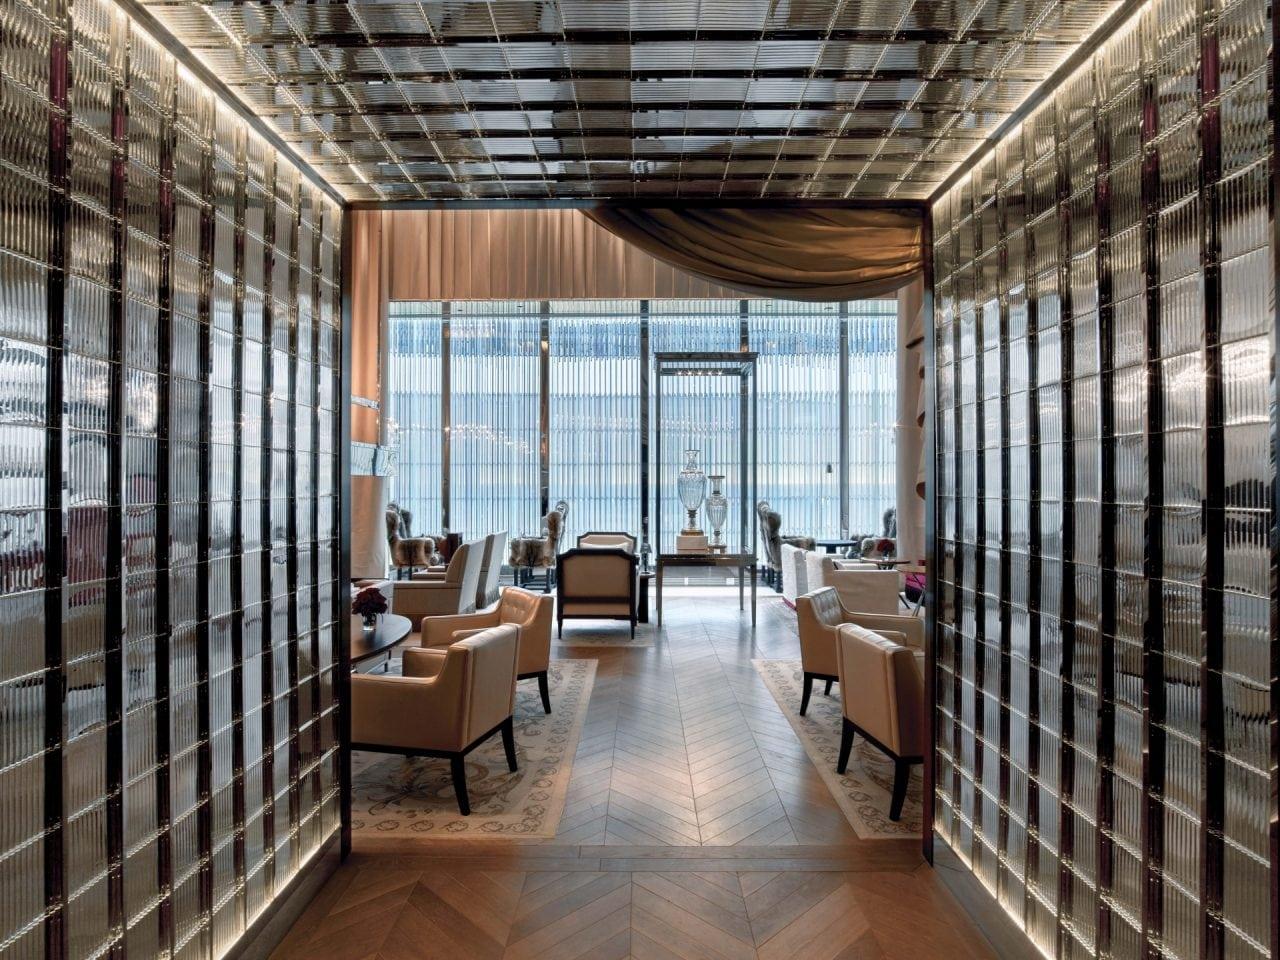 baccarat hotel nyc march 2015 63 - Baccarat: Stralucind ca nou simbol al Manhattan-ului